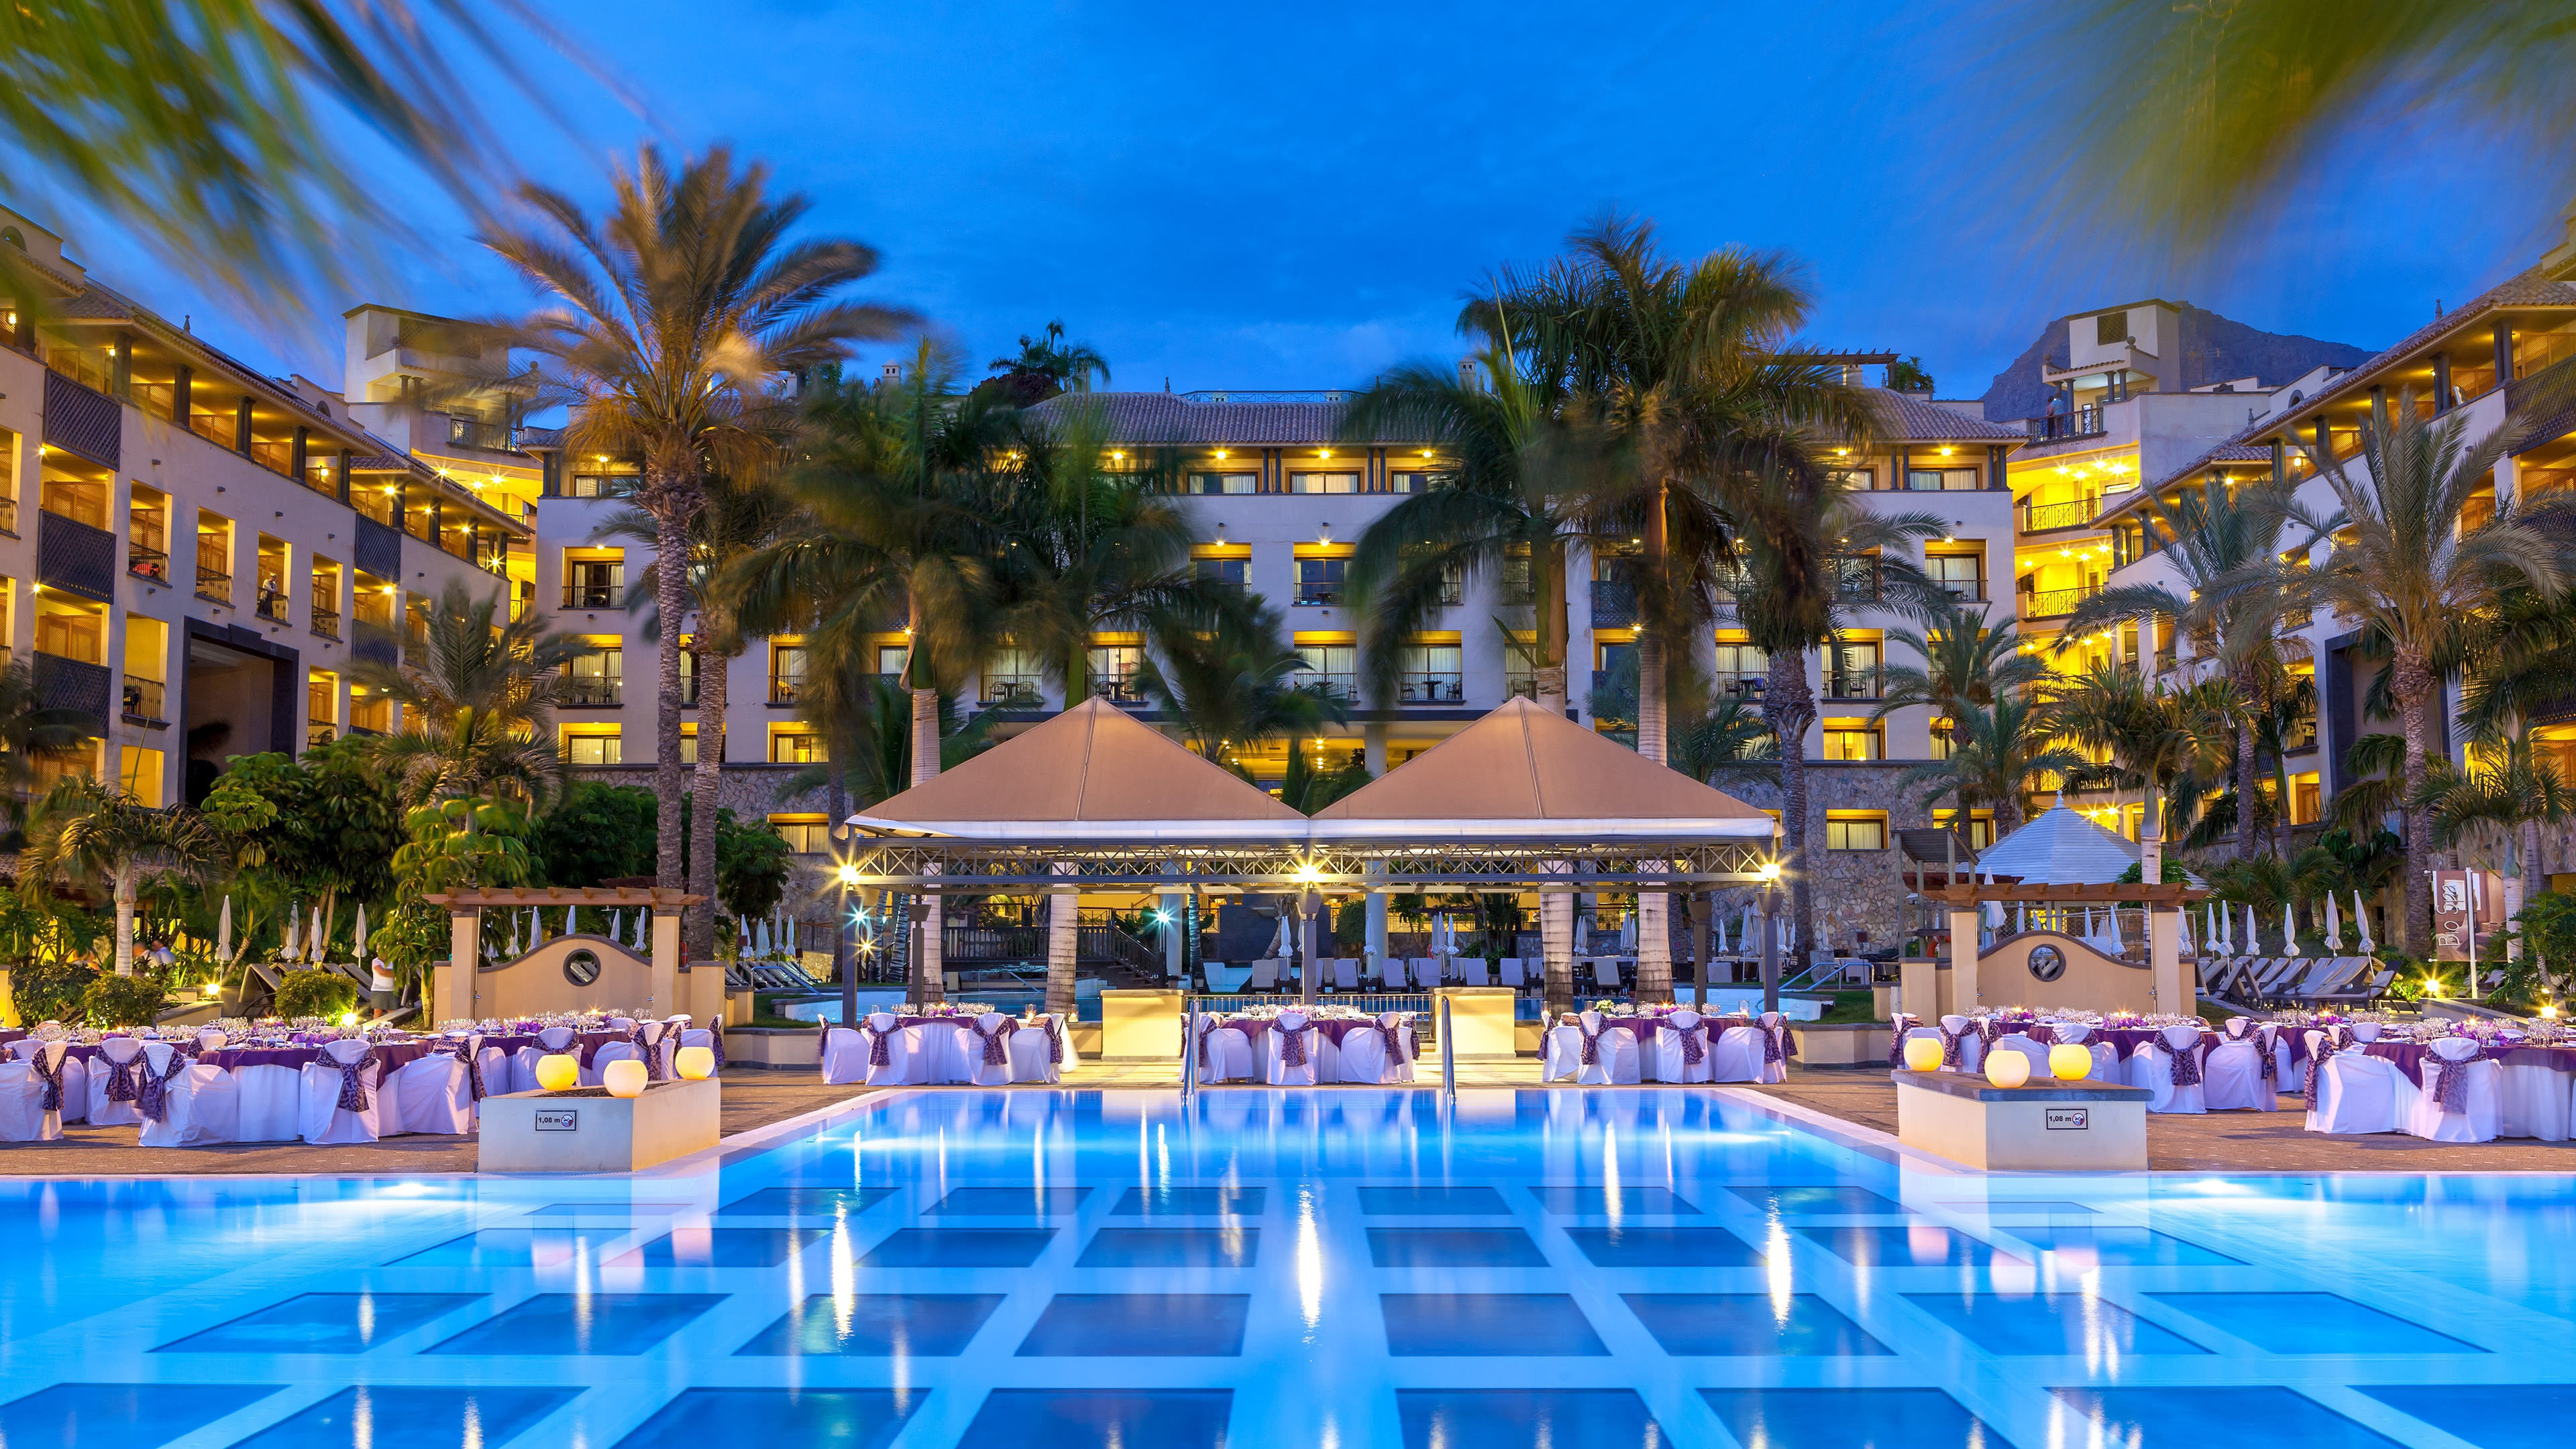 costa adeje gran hotel pool spain uhd 4k wallpaper